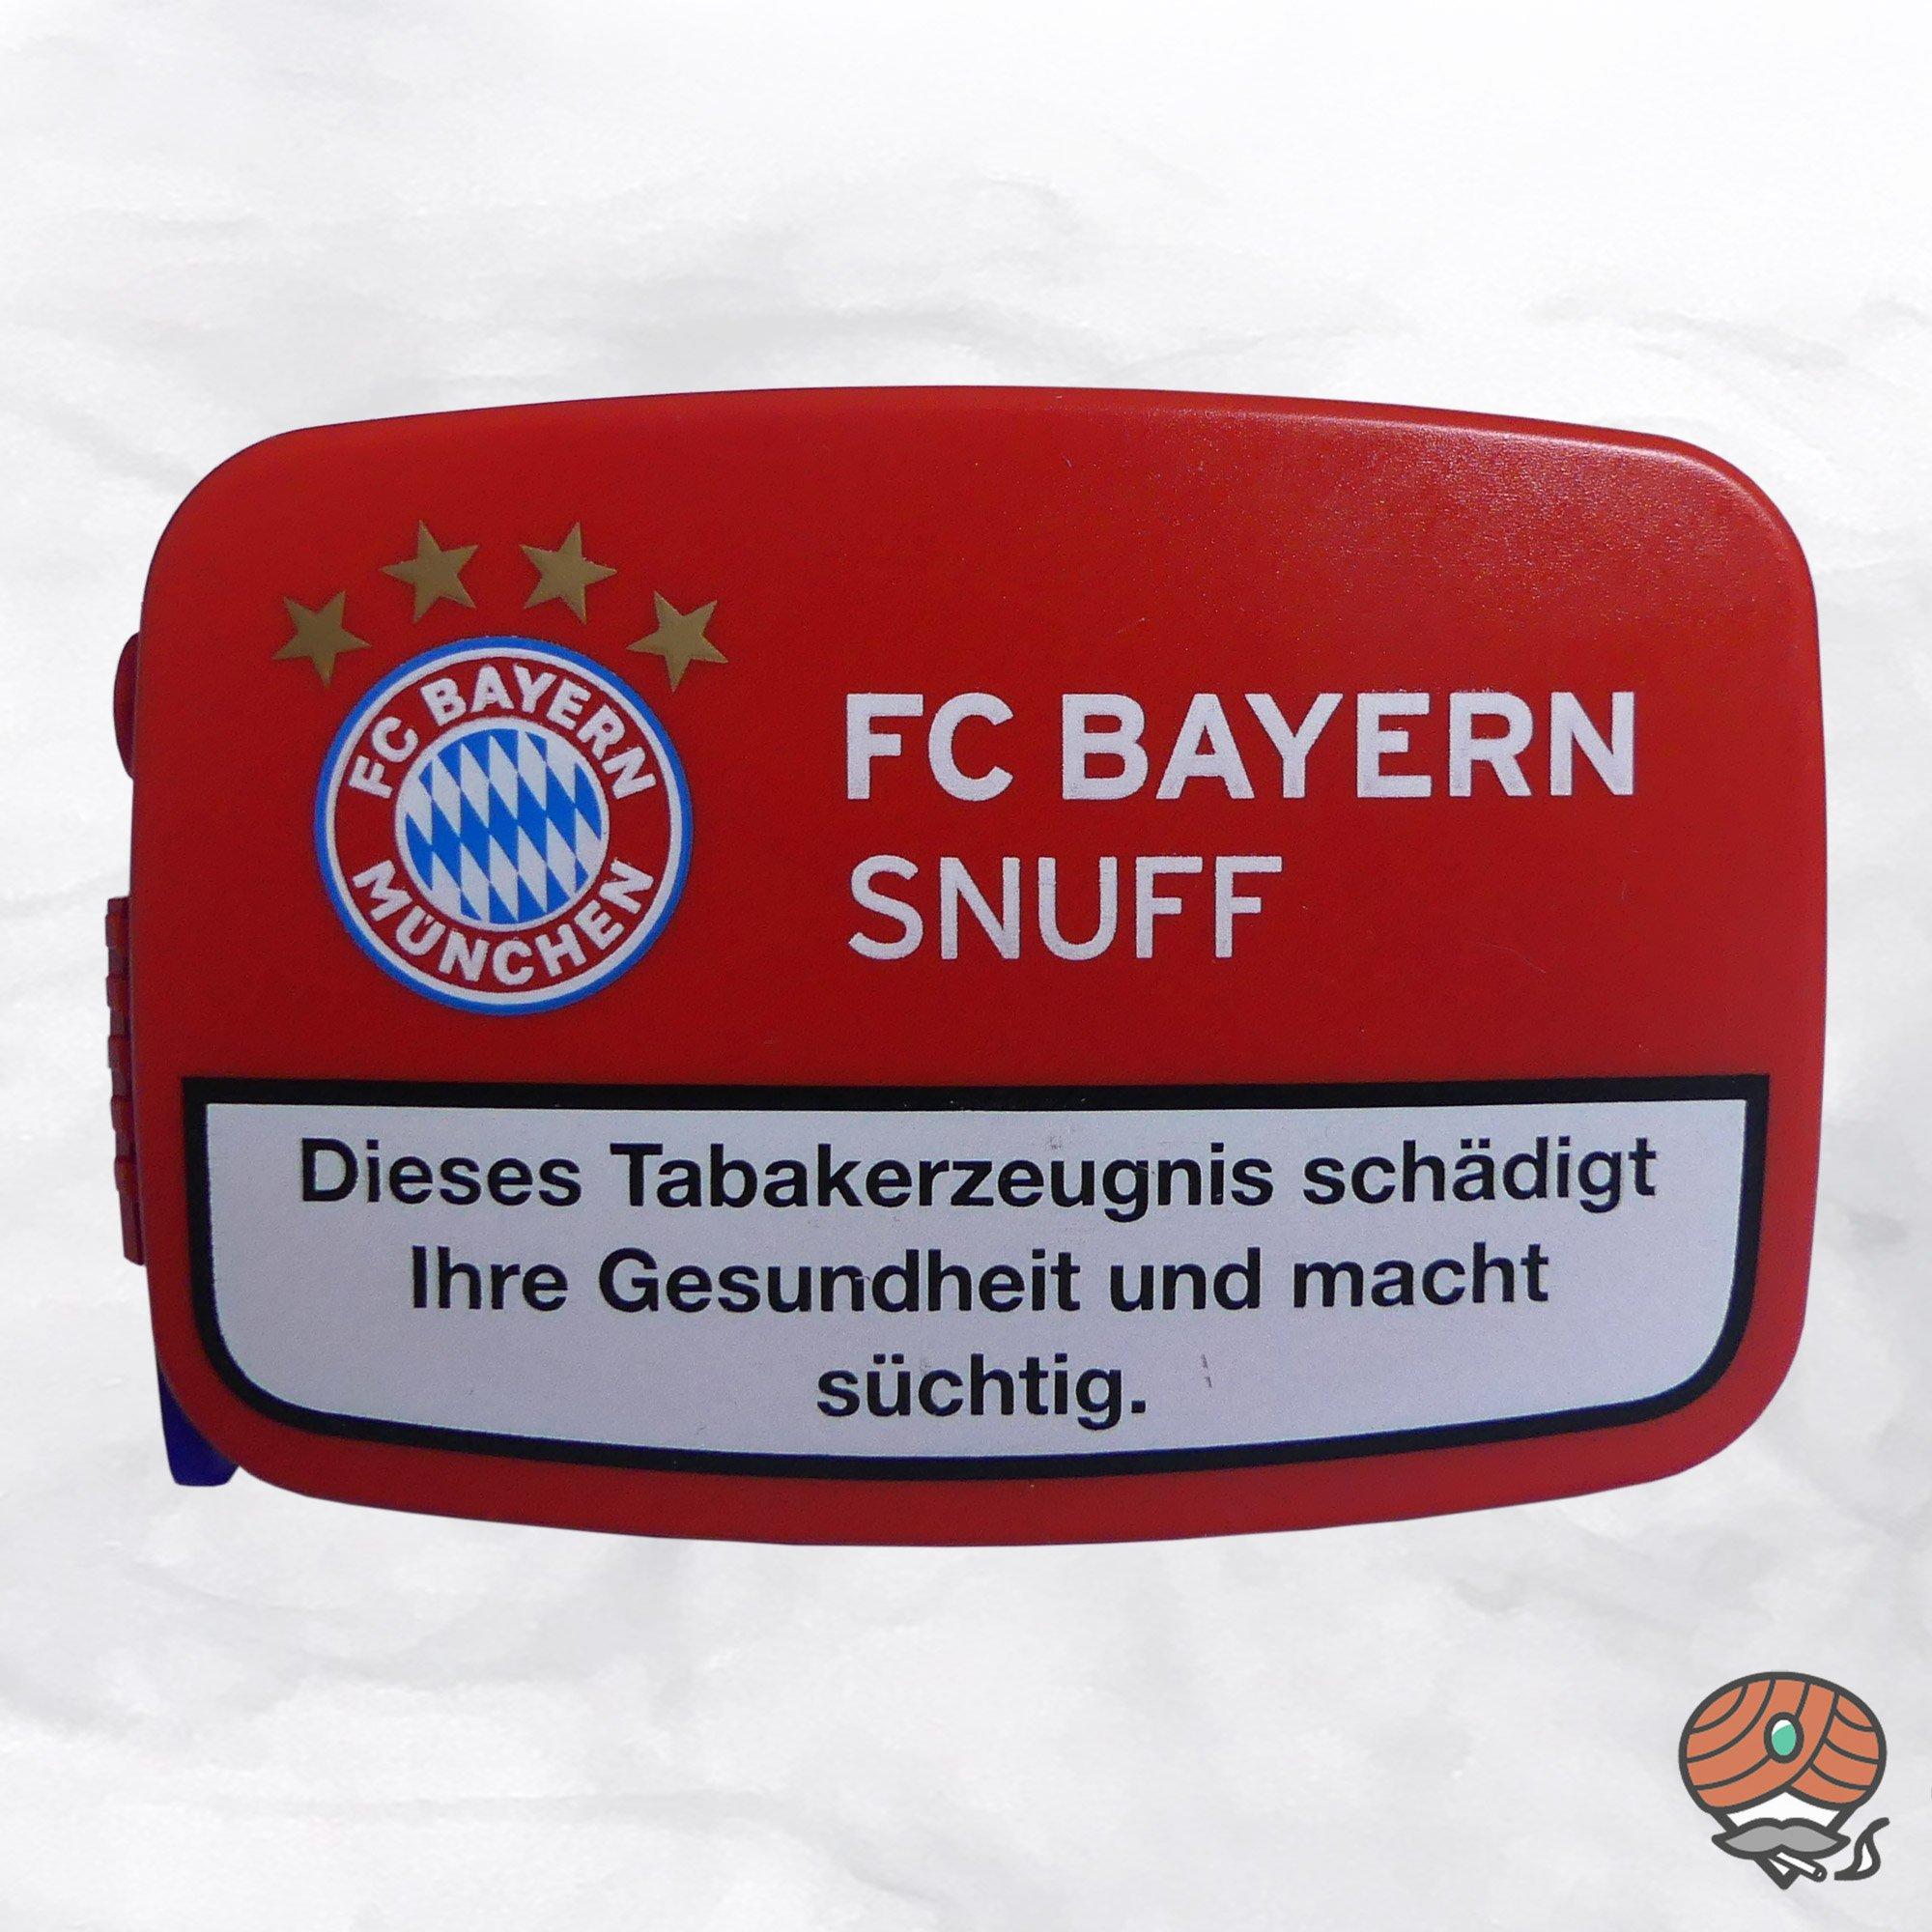 FC BAYERN Snuff Schnupftabak 10g Dose